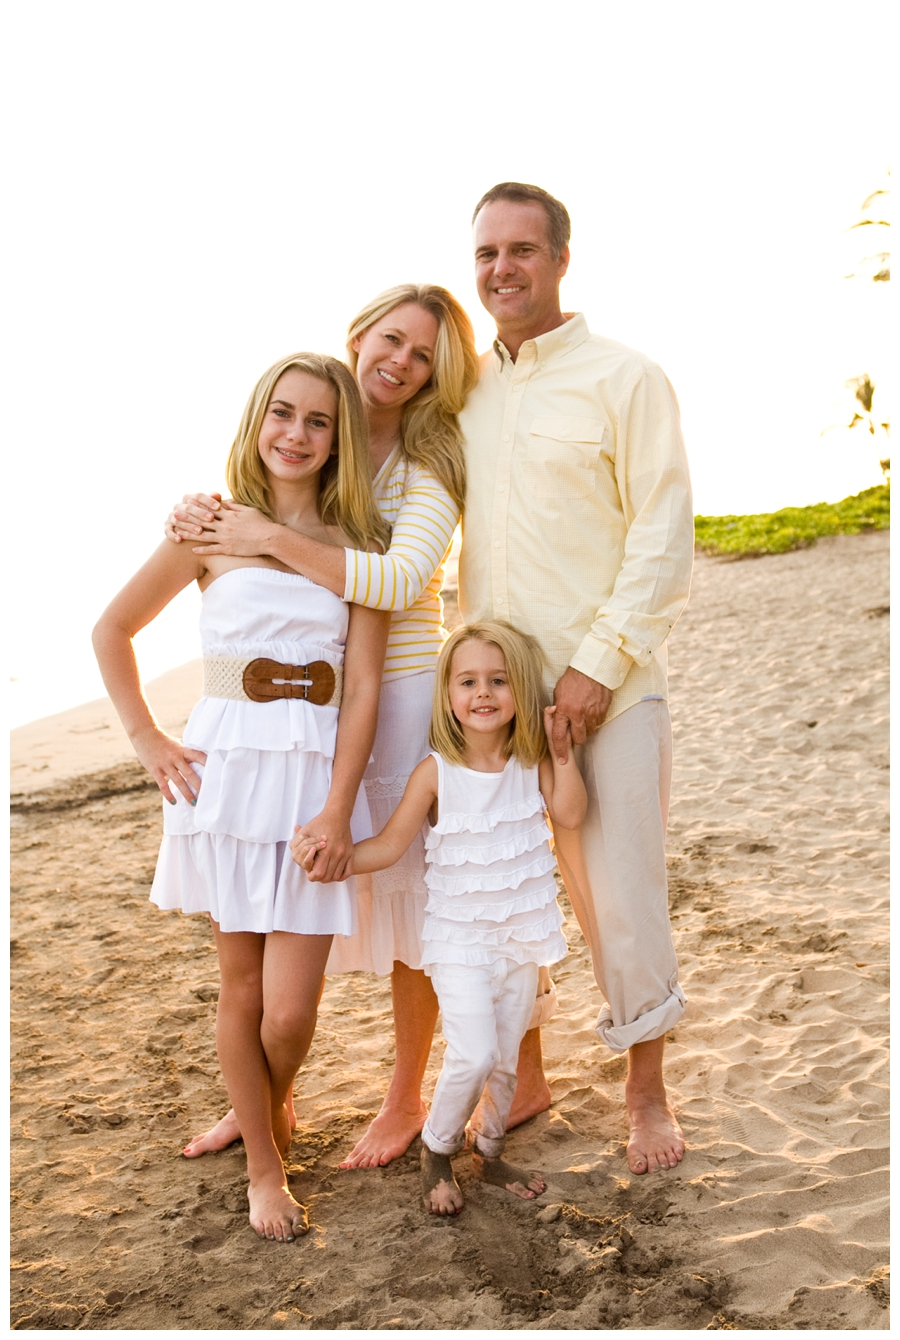 sandiegofamilyphotography-218.jpg